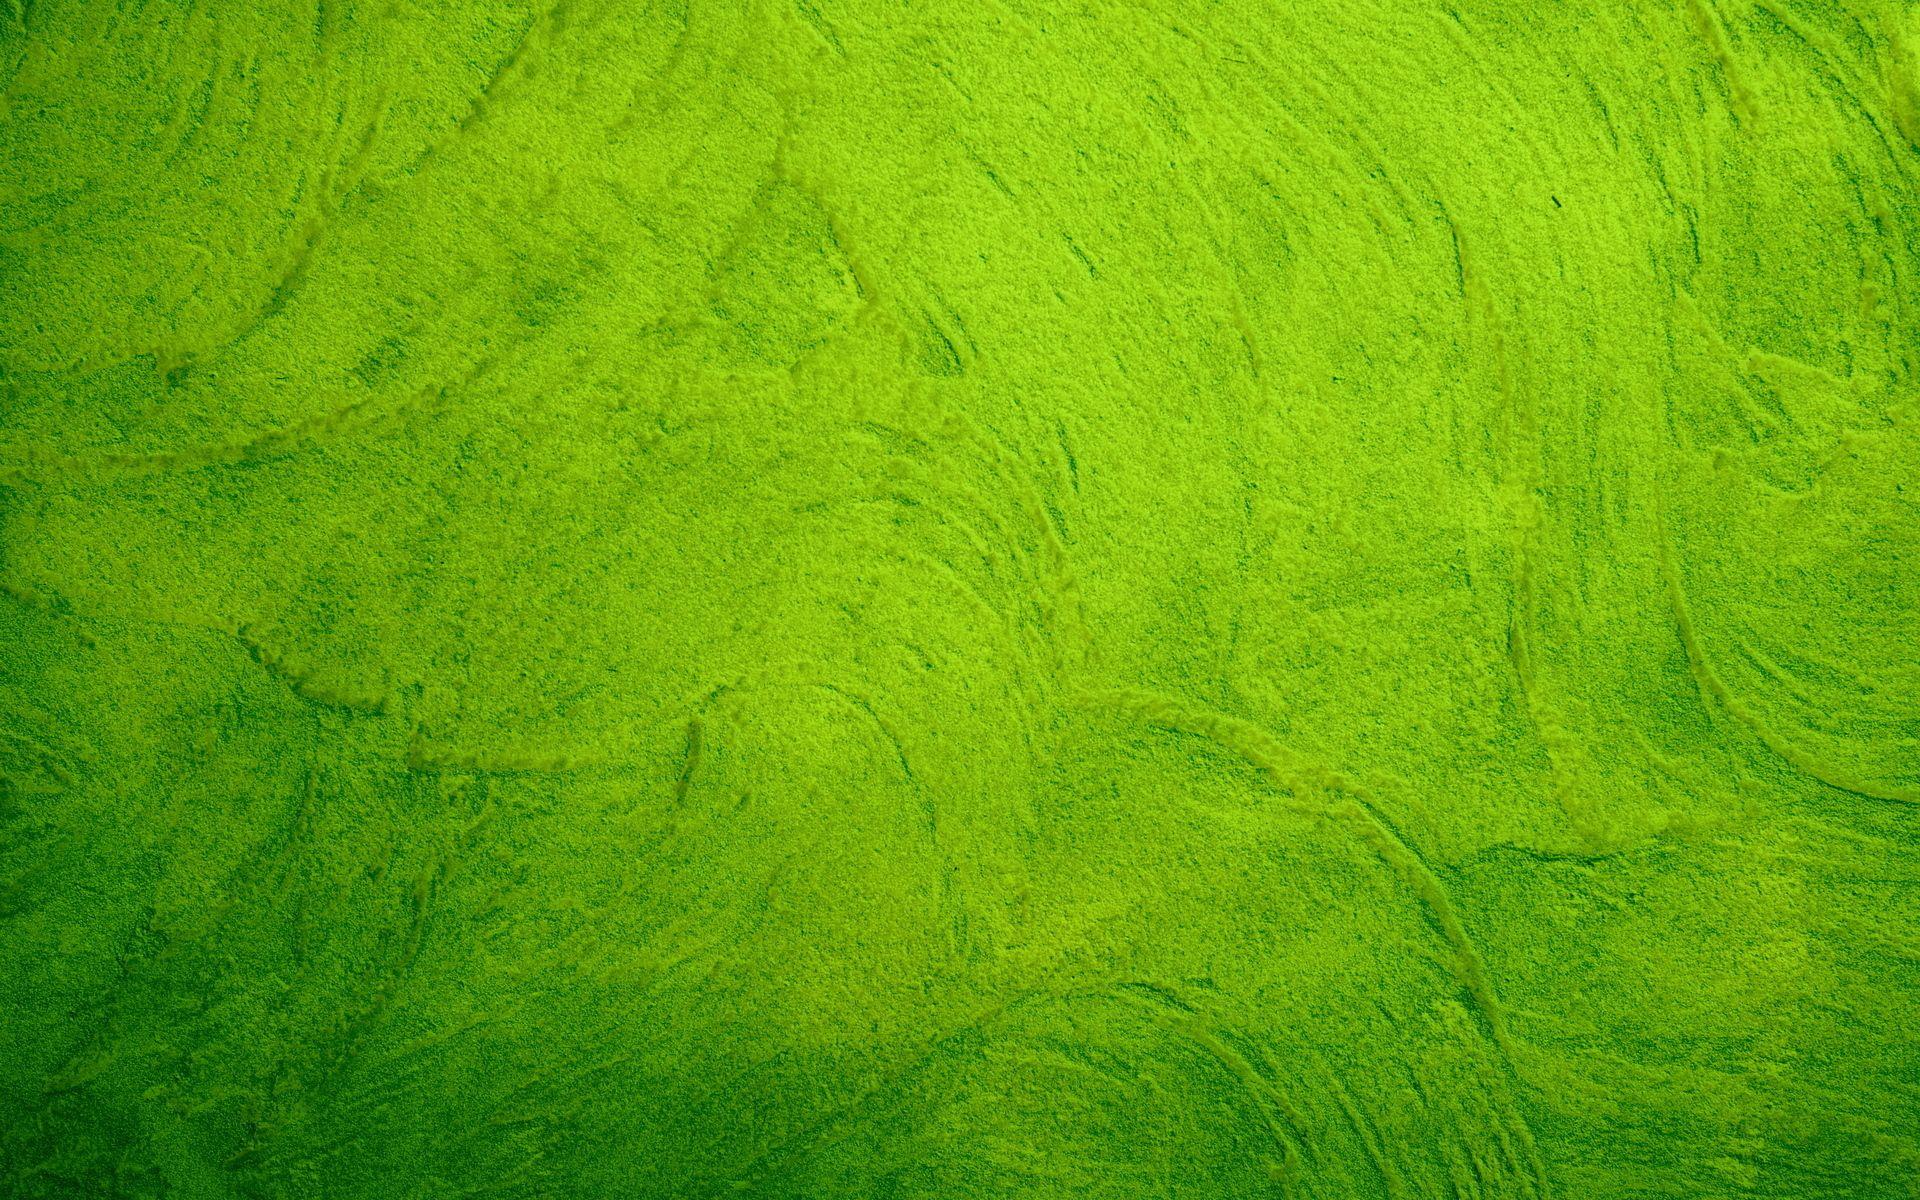 Green Paint Texture Paints Background Download Photo Green Paint Texture Background Green Texture Background Texture Background Hd Textured Background